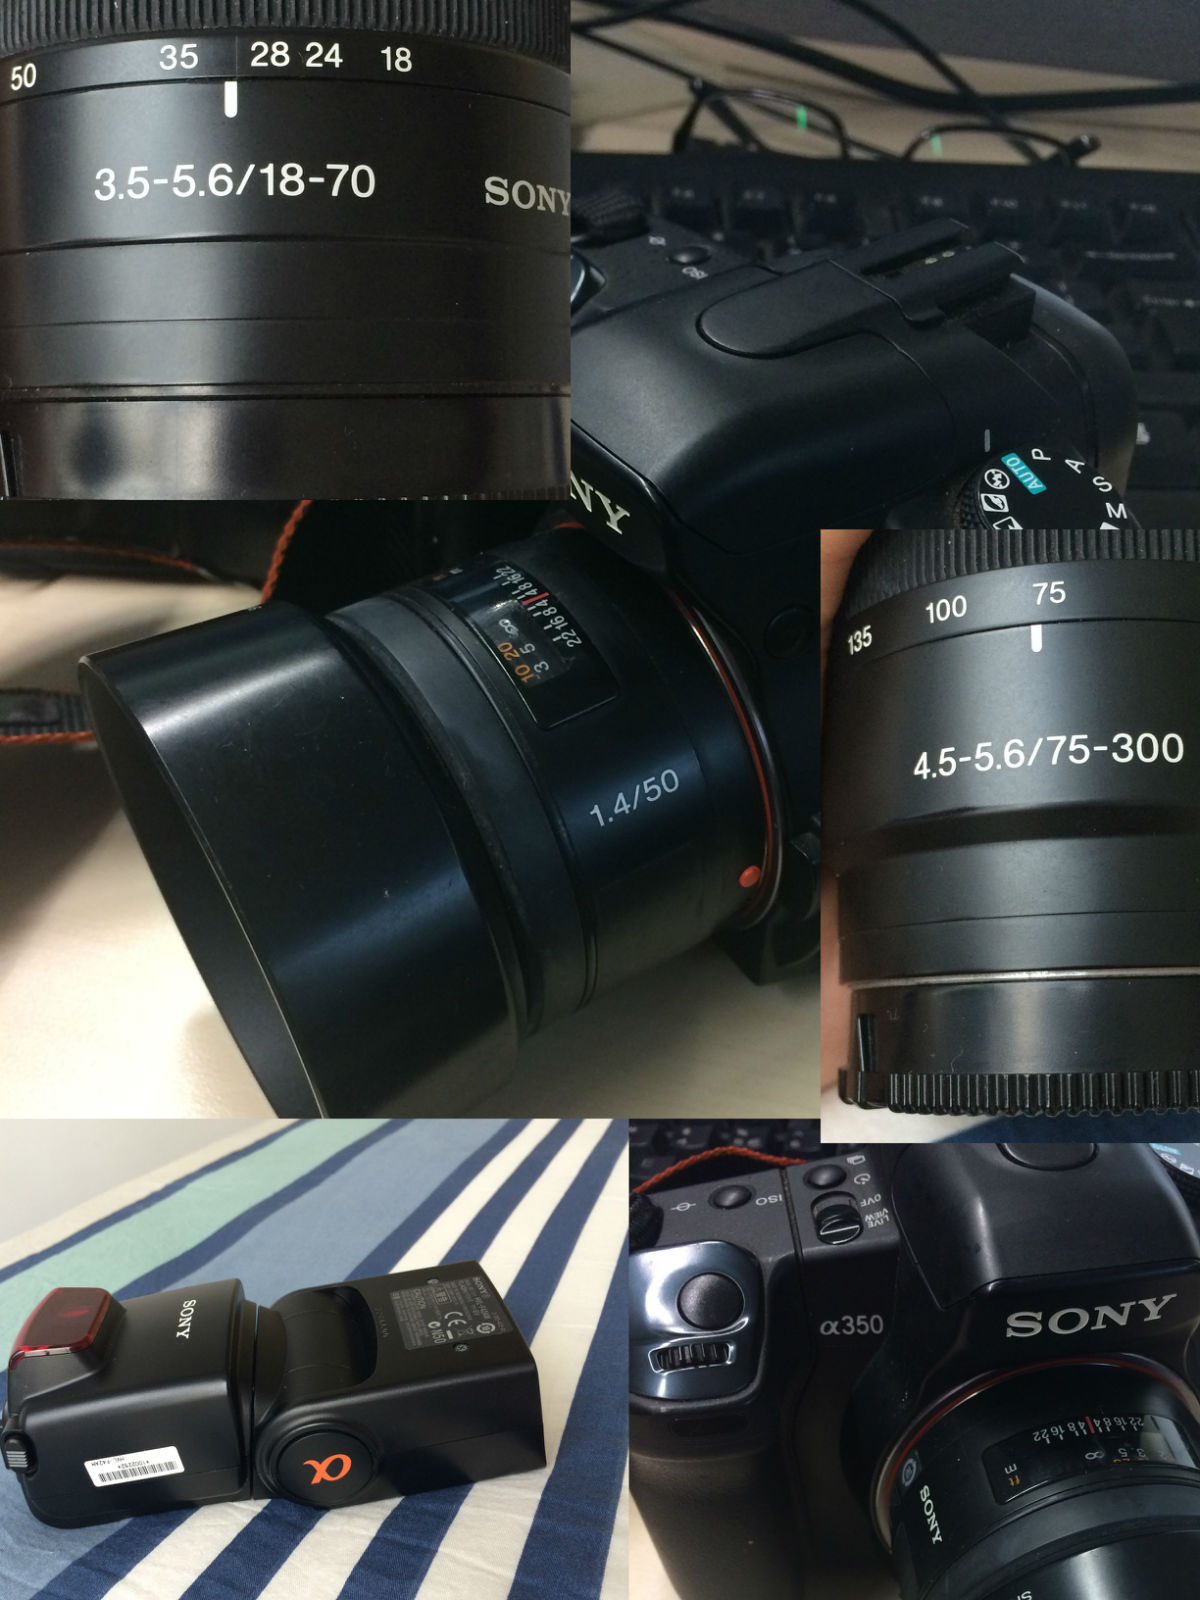 sony单反相机镜头闪光灯